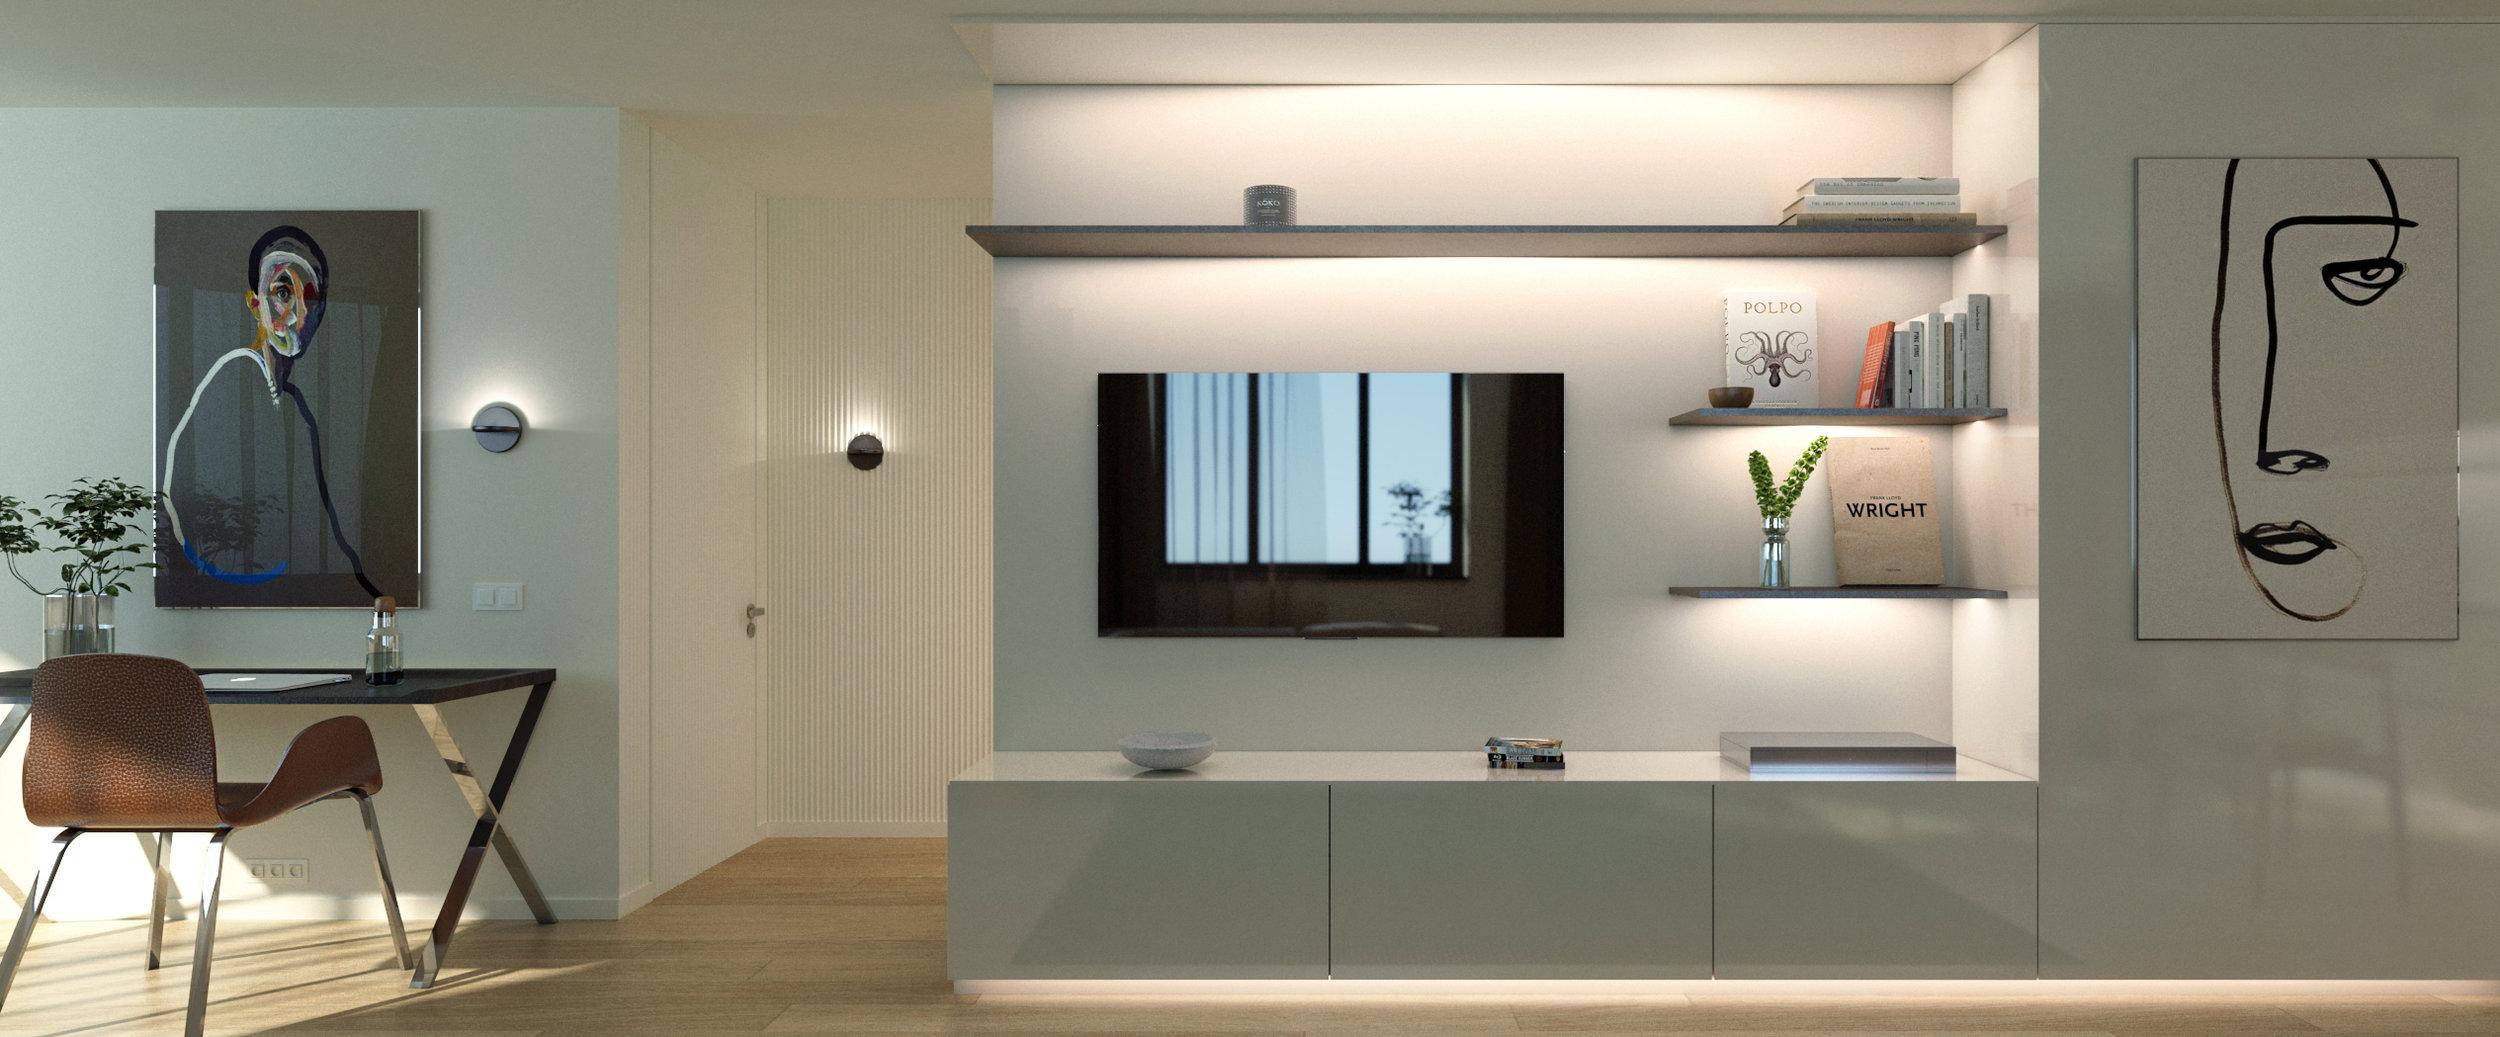 London_Apartment_Gila_Shemie_Zakay_Bre (8).jpg